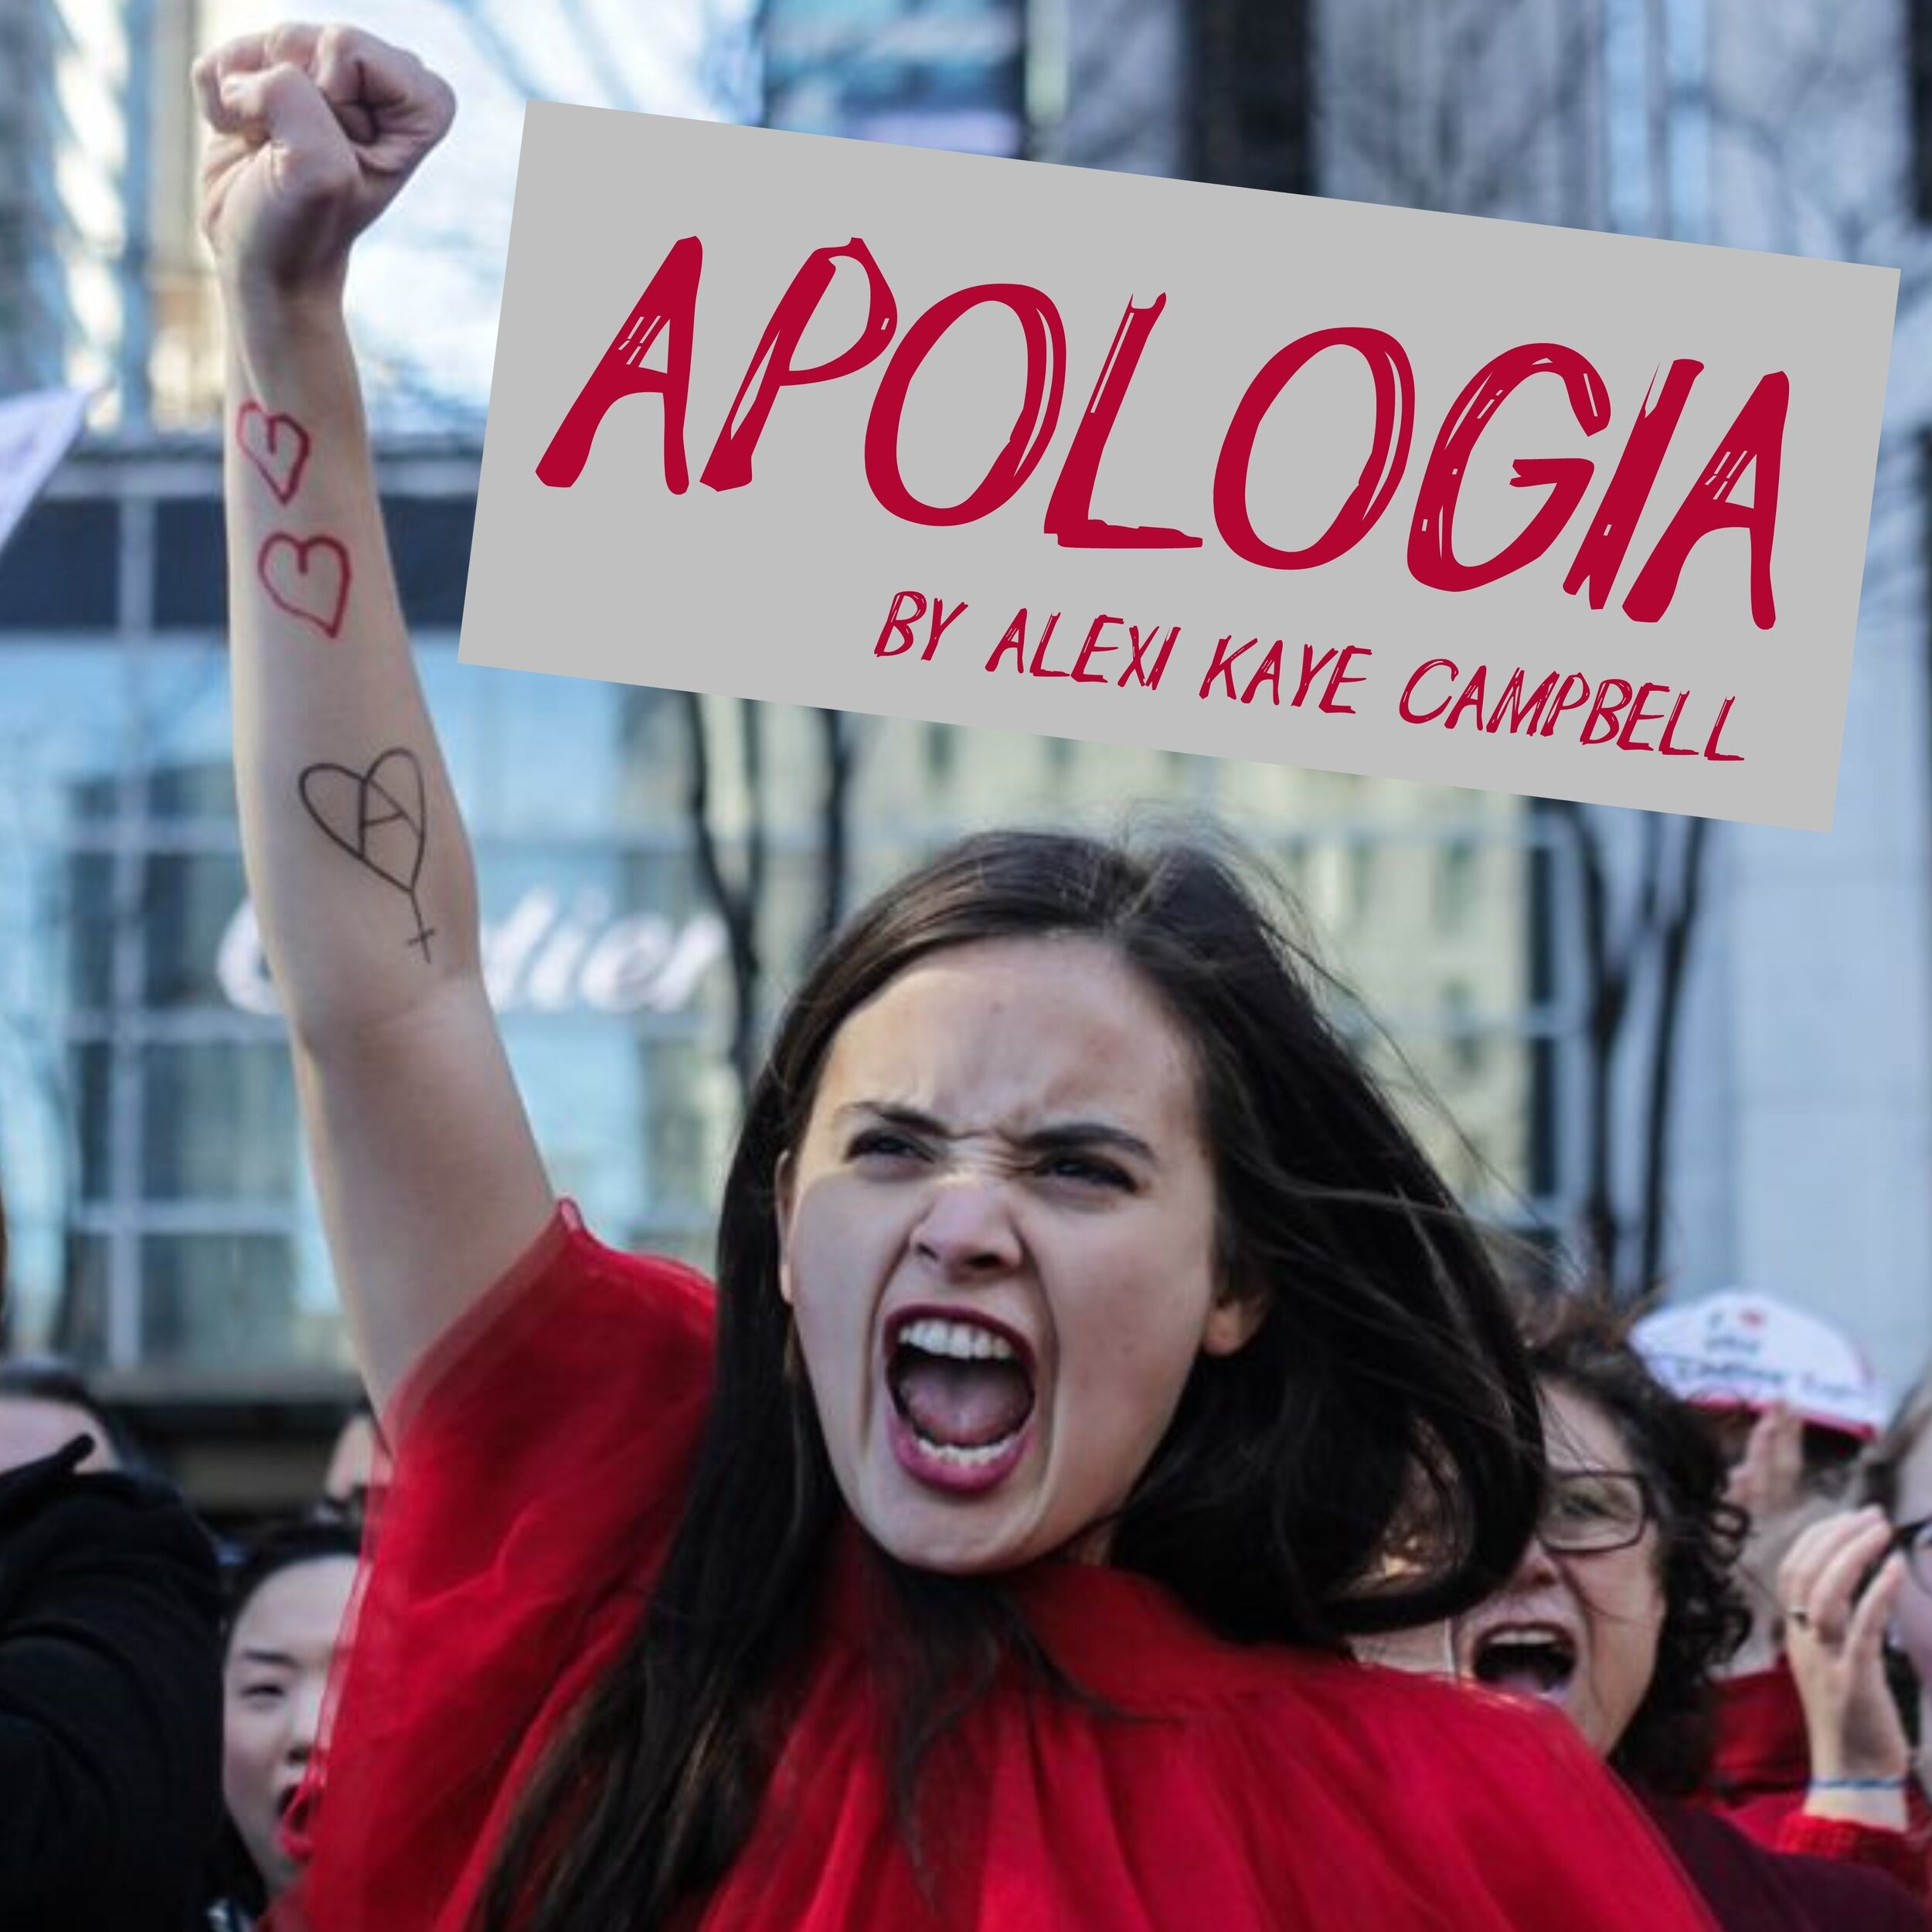 Apologia web image.jpg